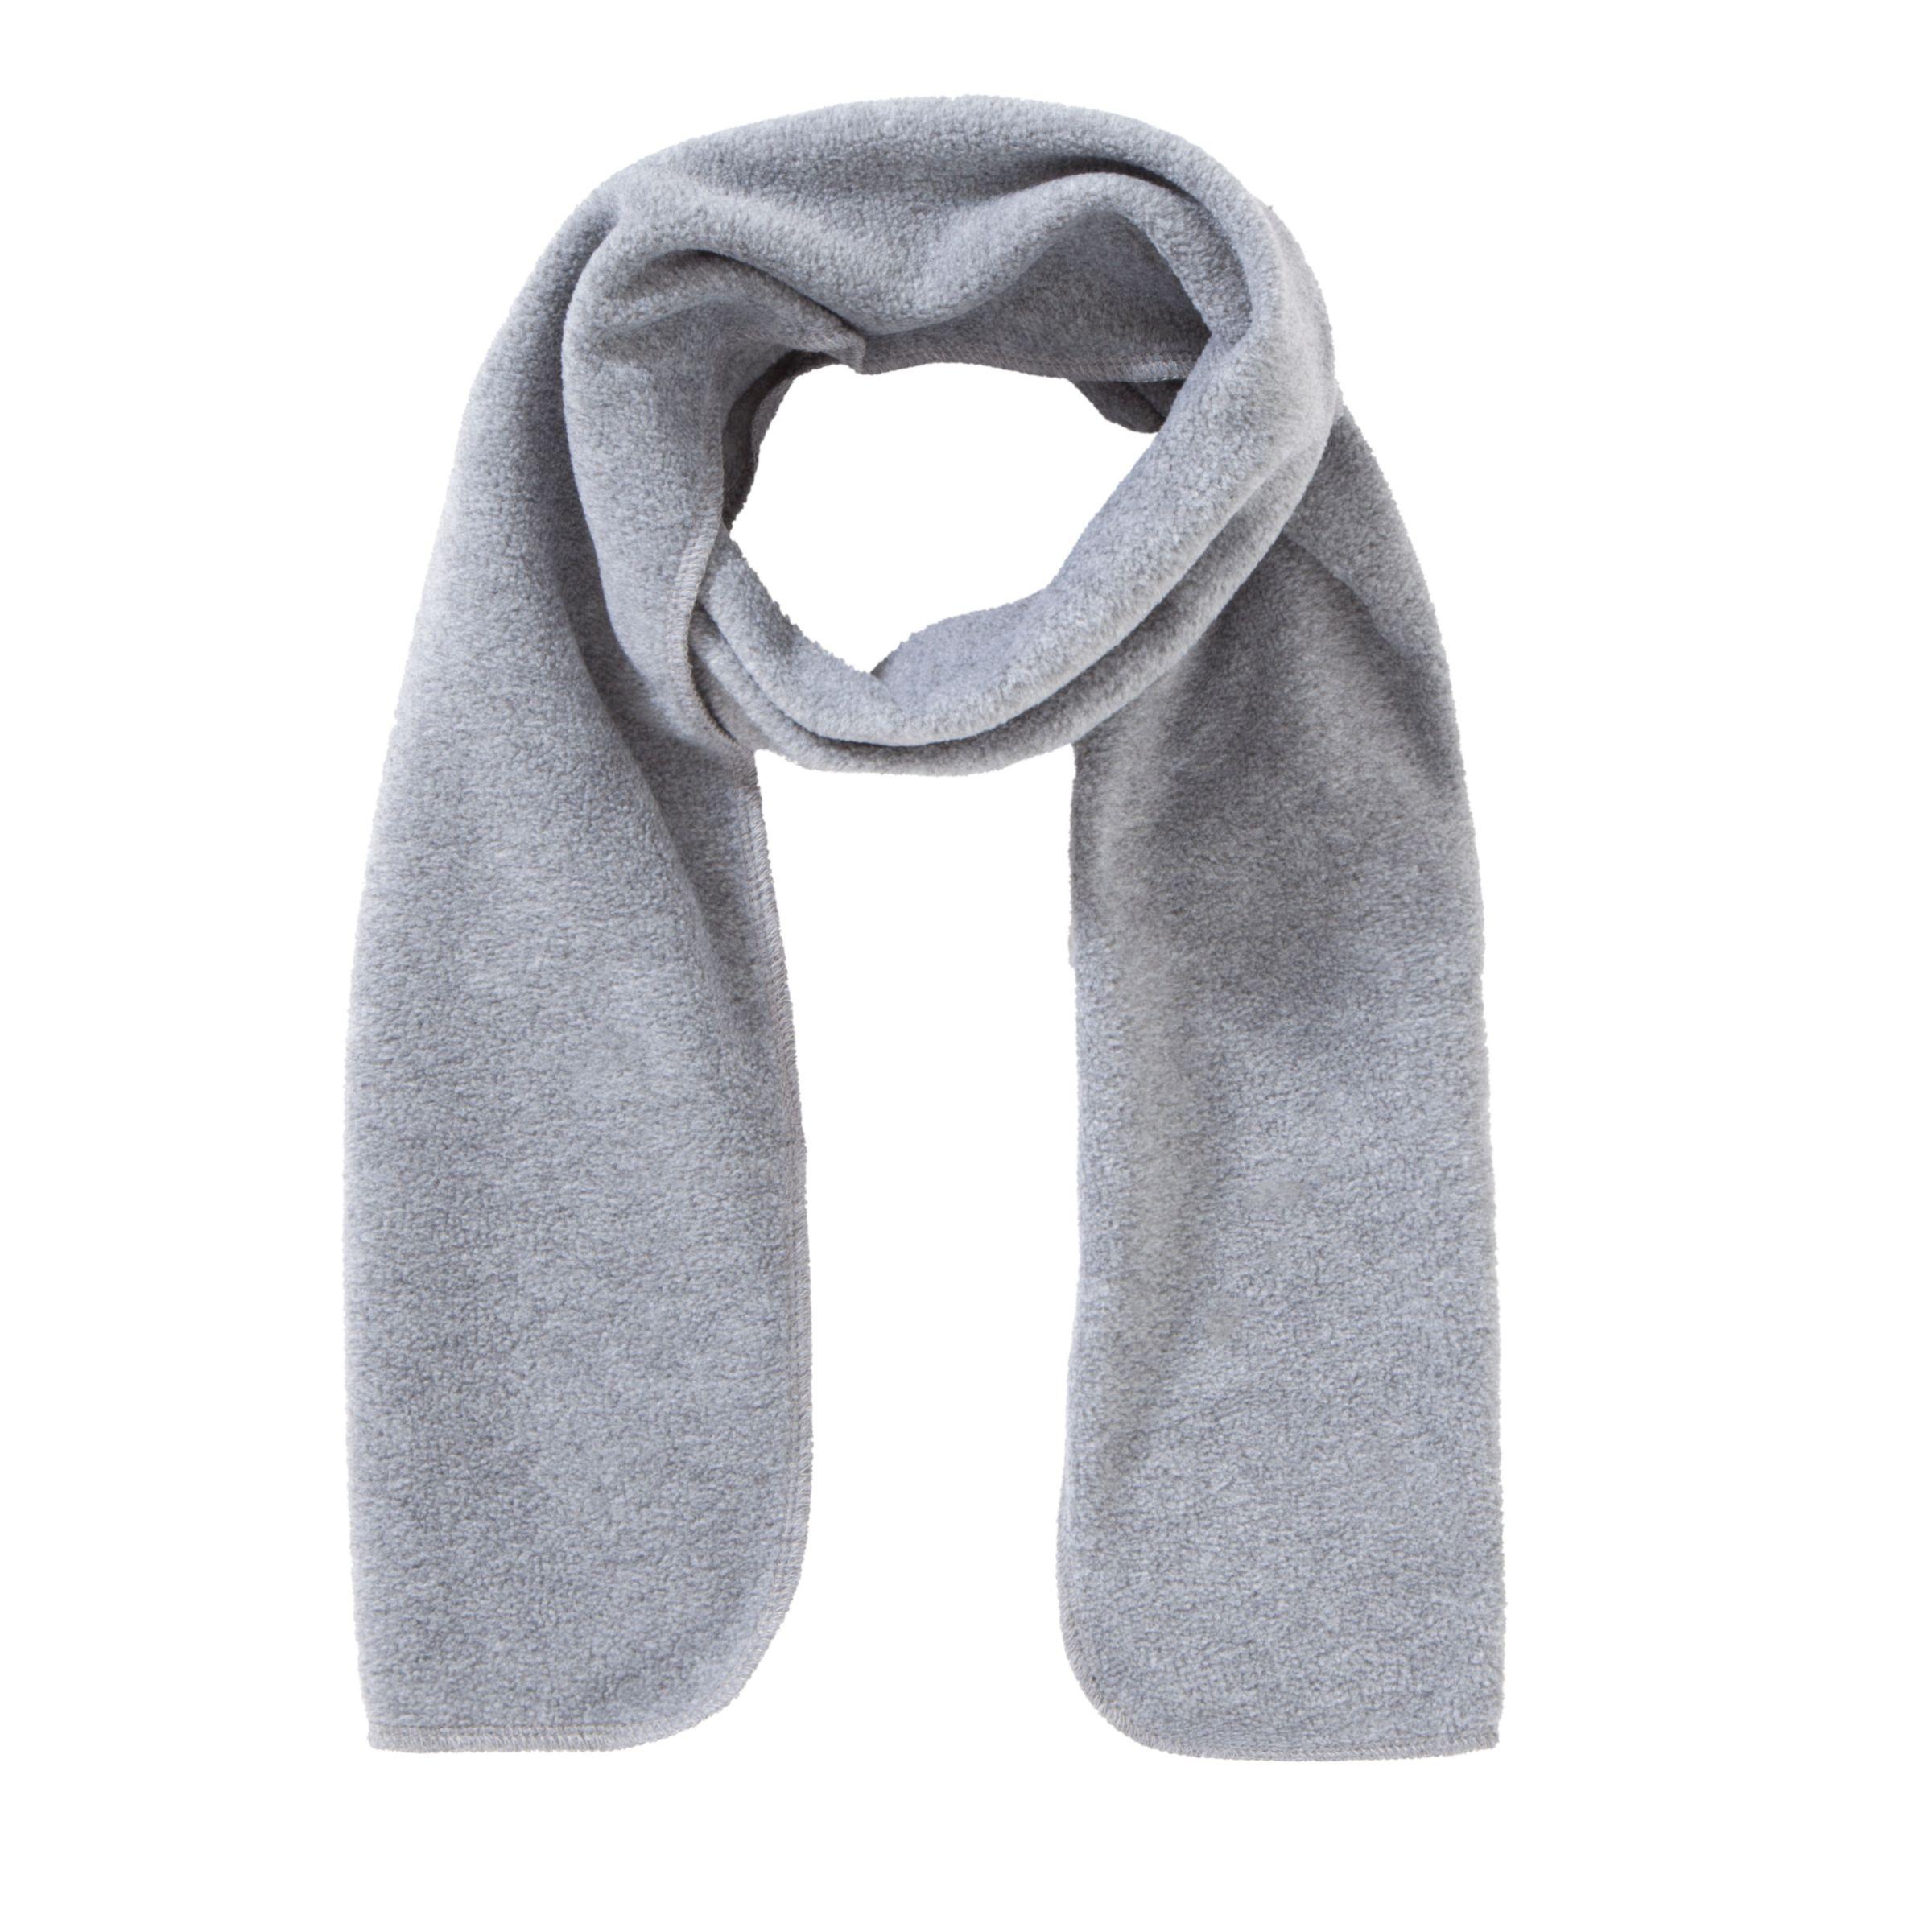 Unbranded School Fleece Scarf, One Size, Grey